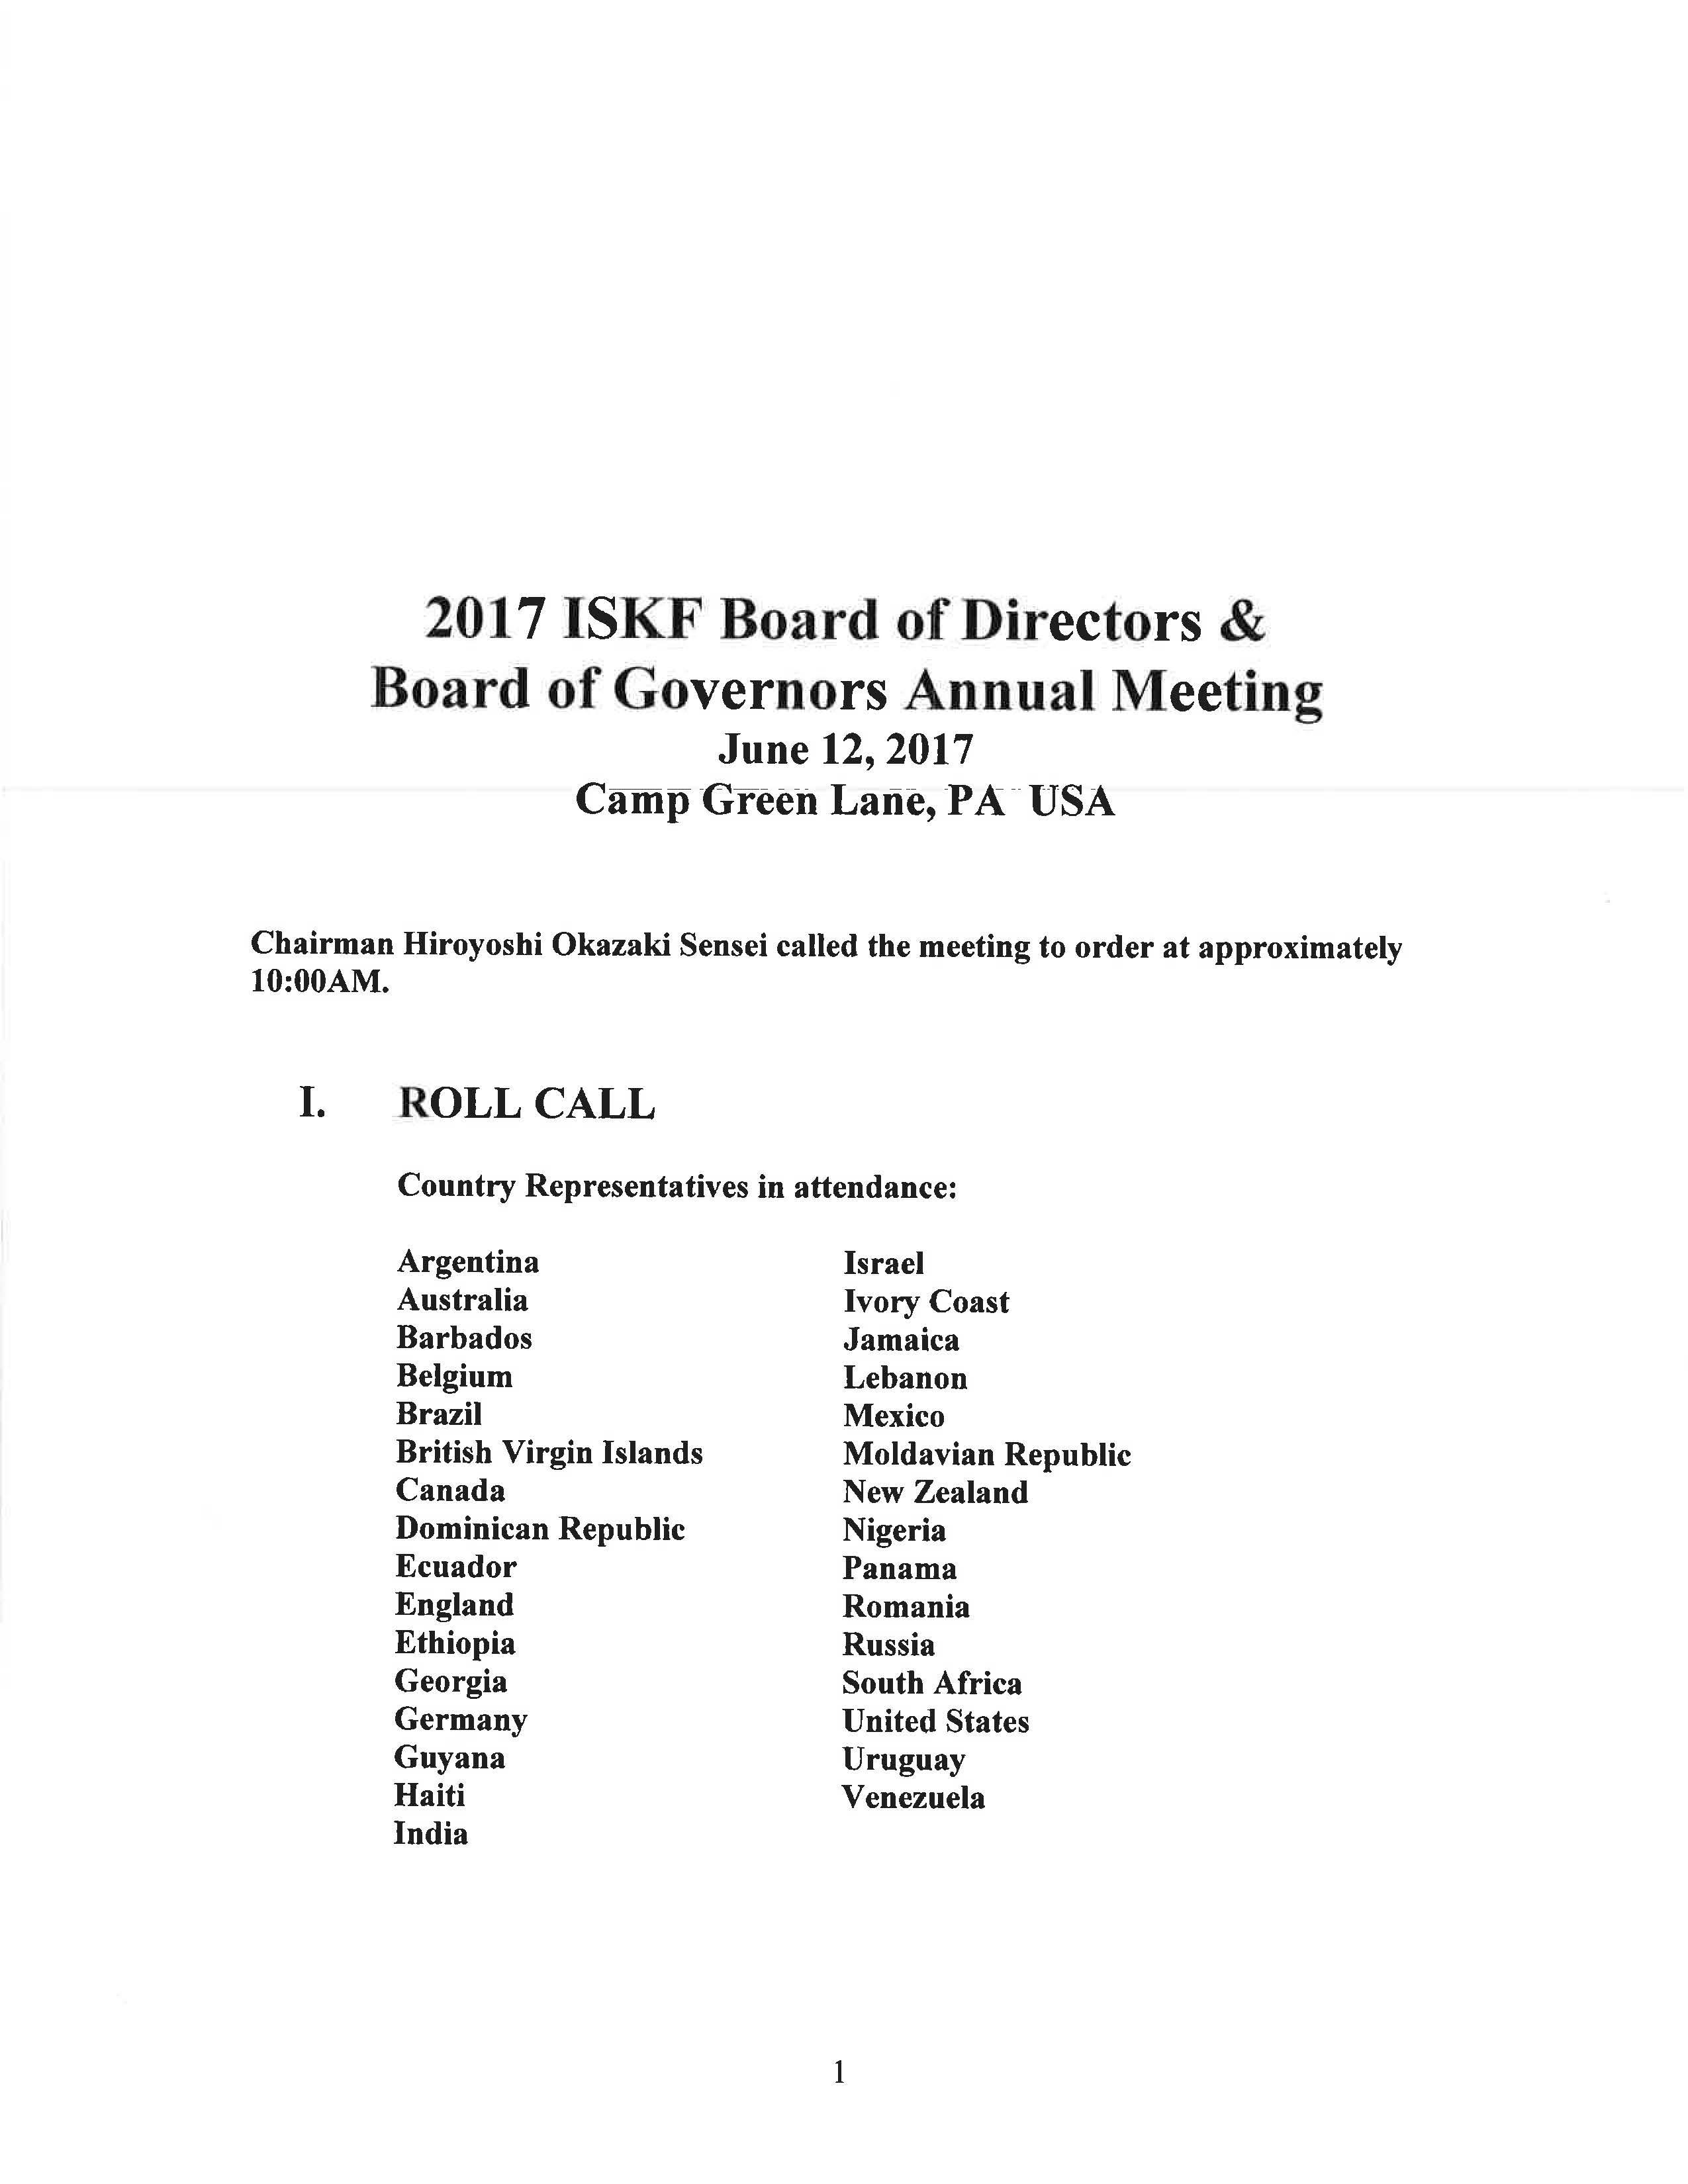 2017 Intl Board mtg Camp notes_Page_1